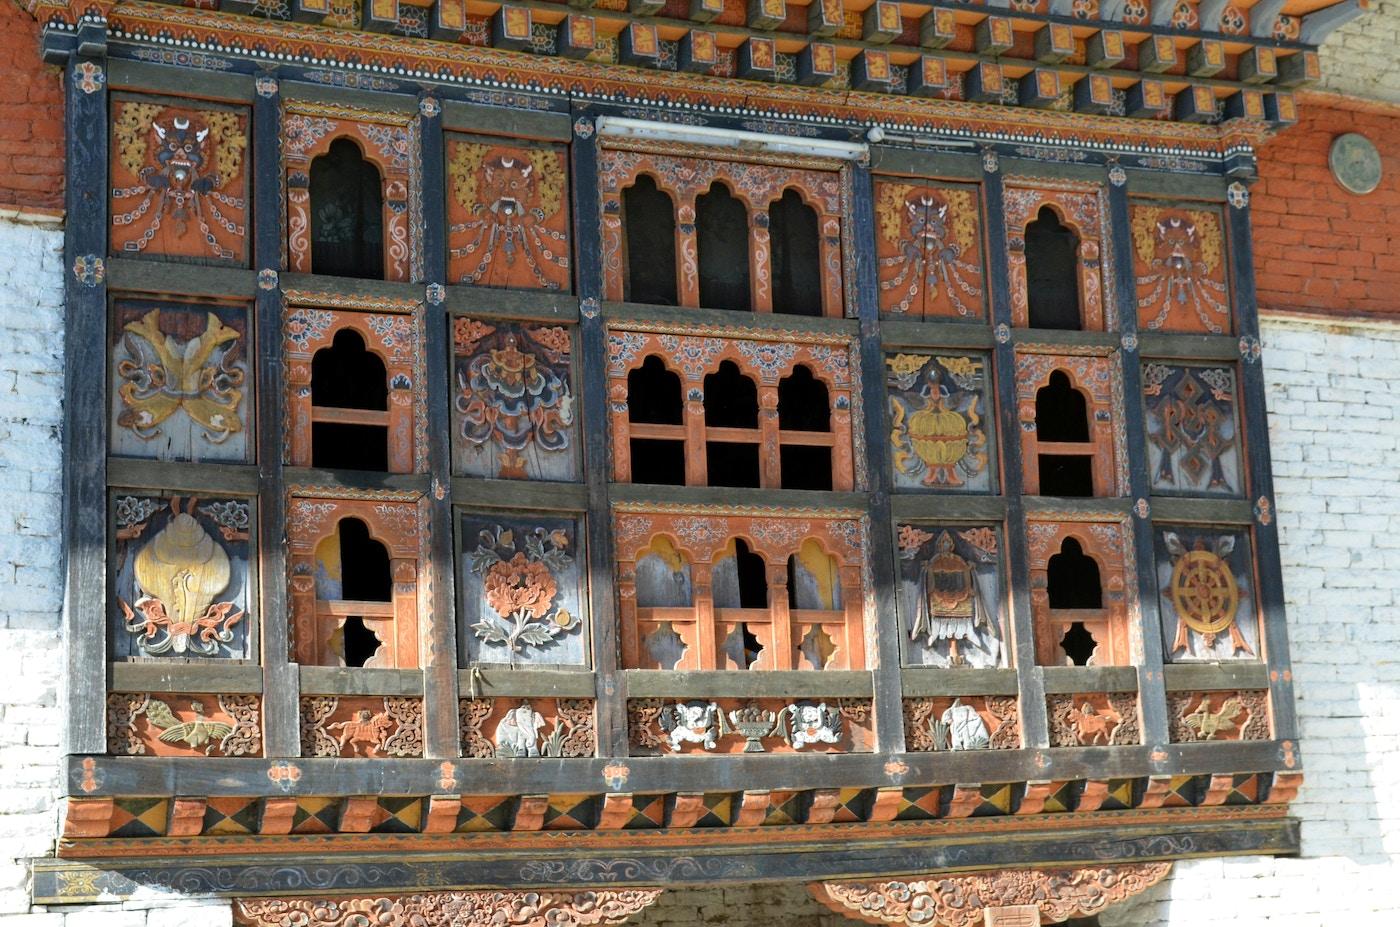 Window of Samten Chöling Temple